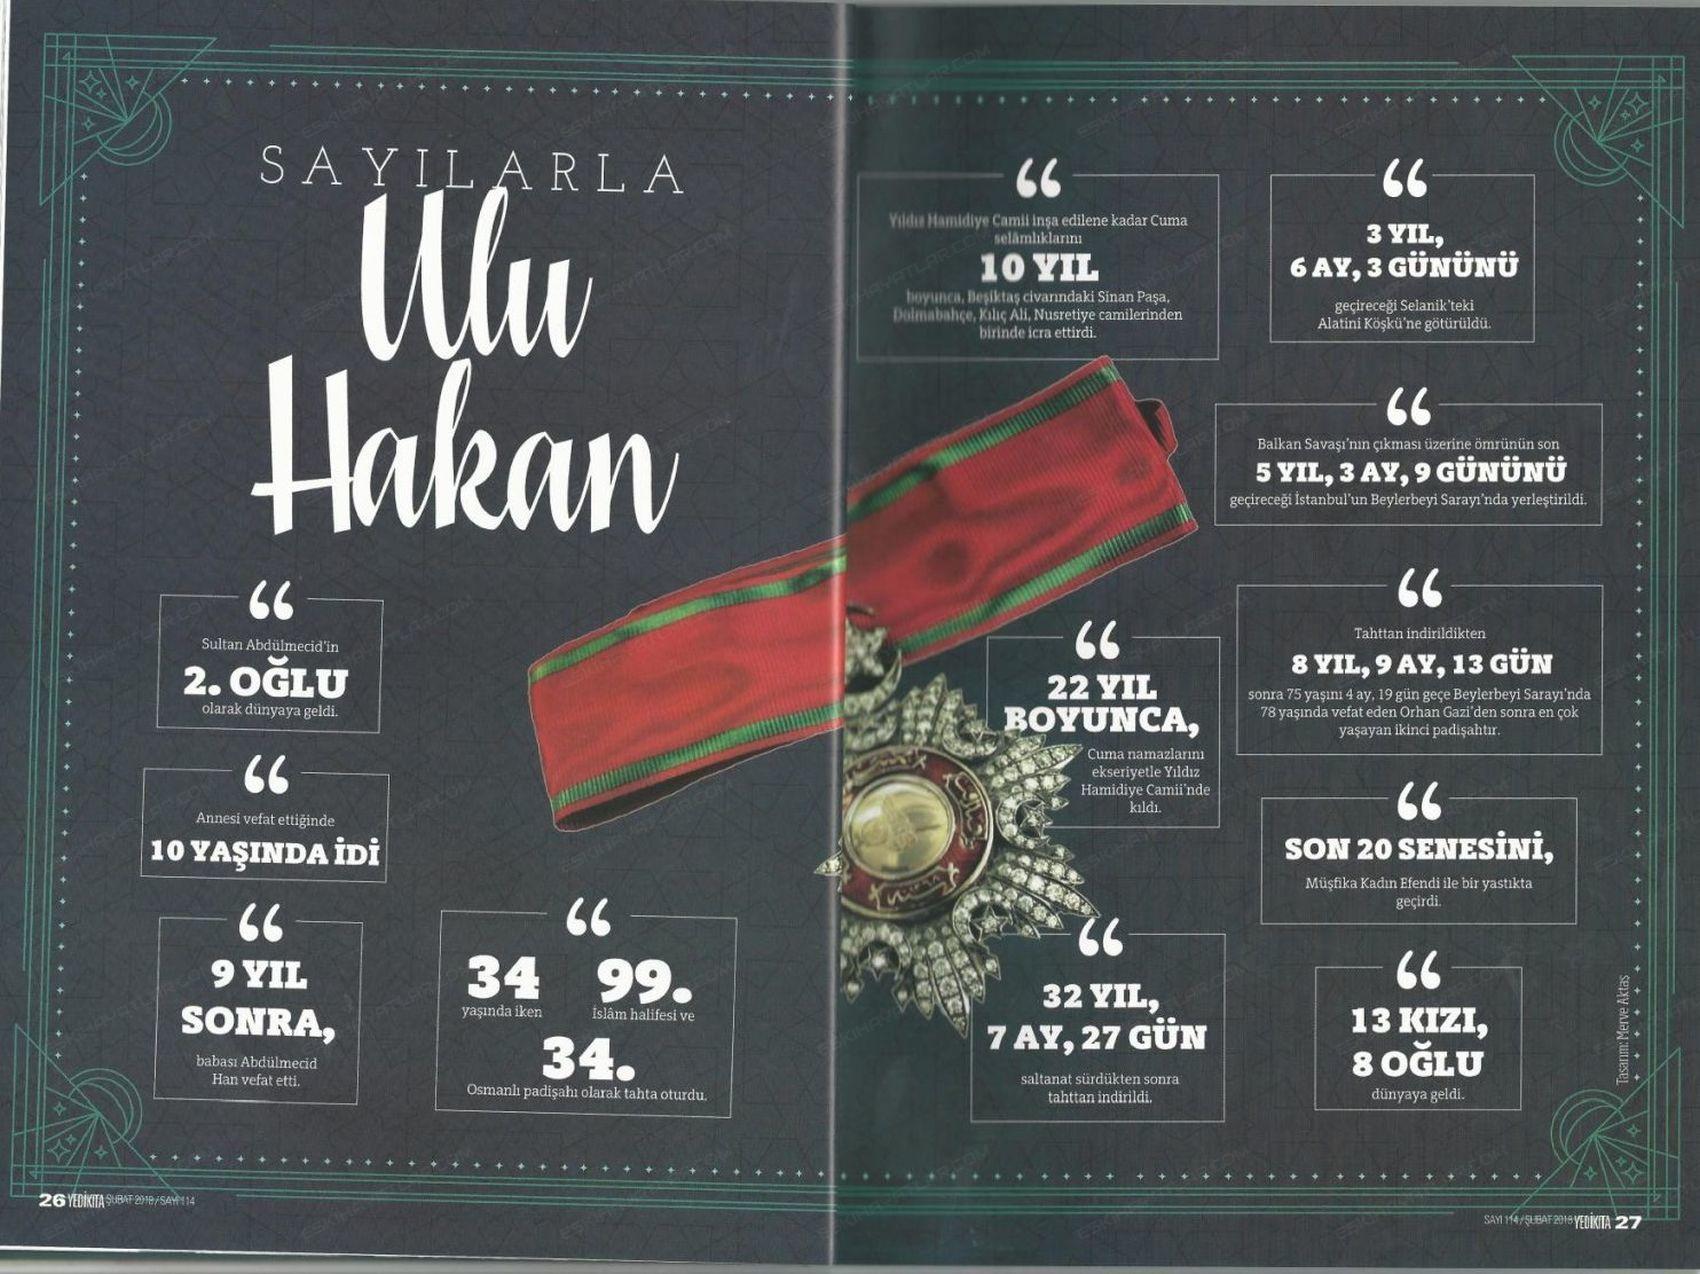 0369-sultan-abdulhamid-vefatinin-100-yili-yedi-kita-dergisi-abdulhamid-belgeseli (12)